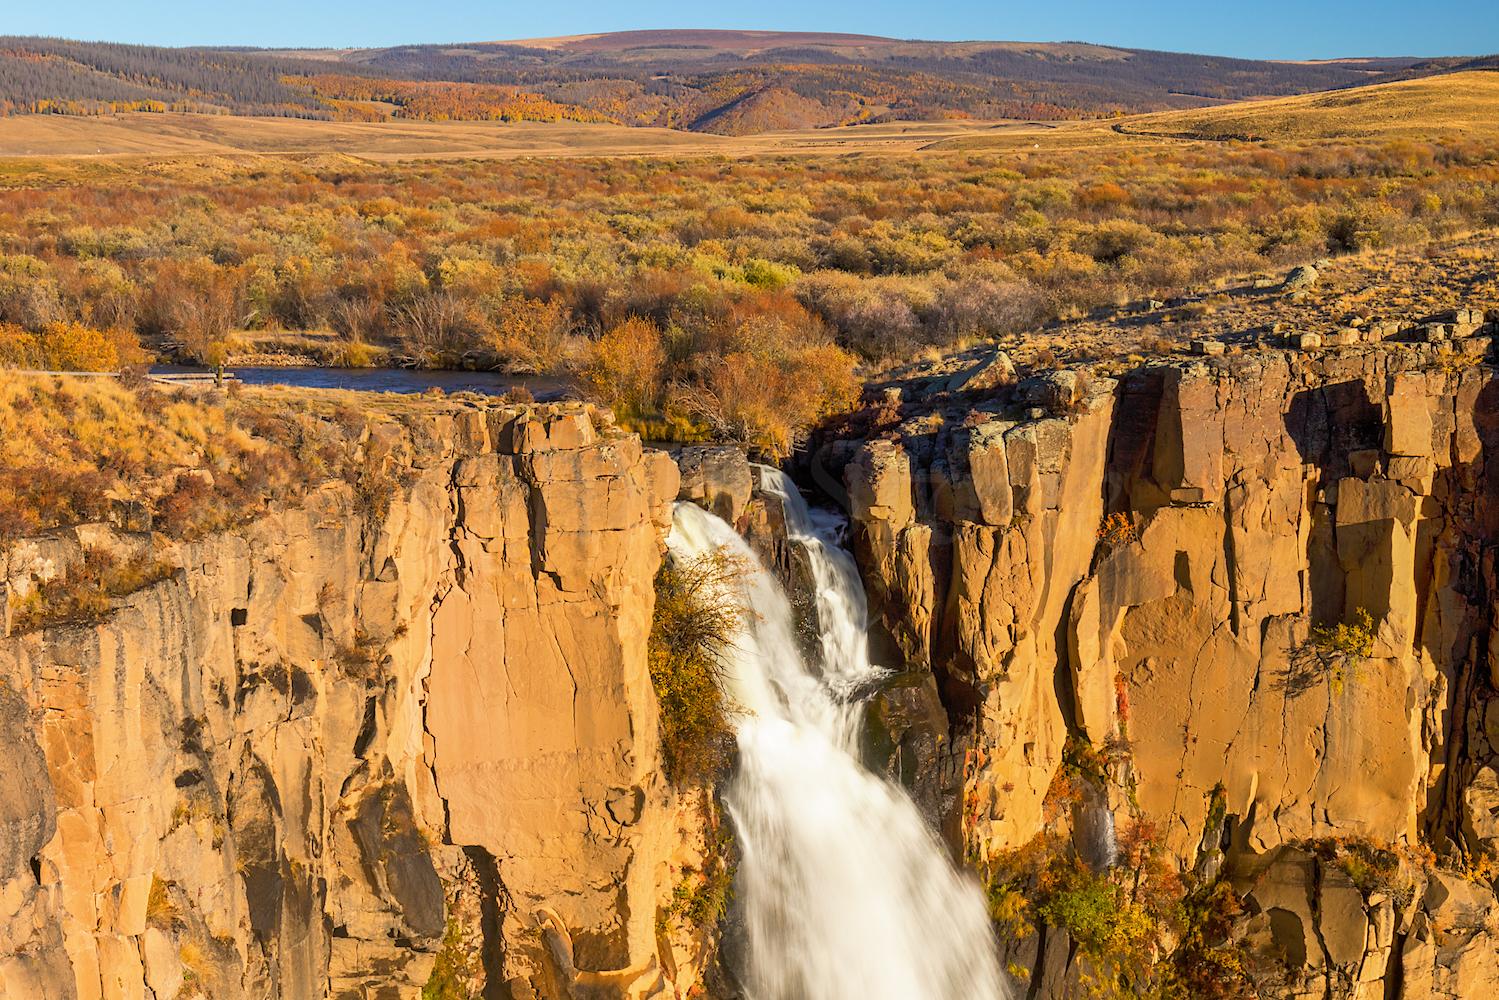 North Clear Creek Falls, Image # 4773